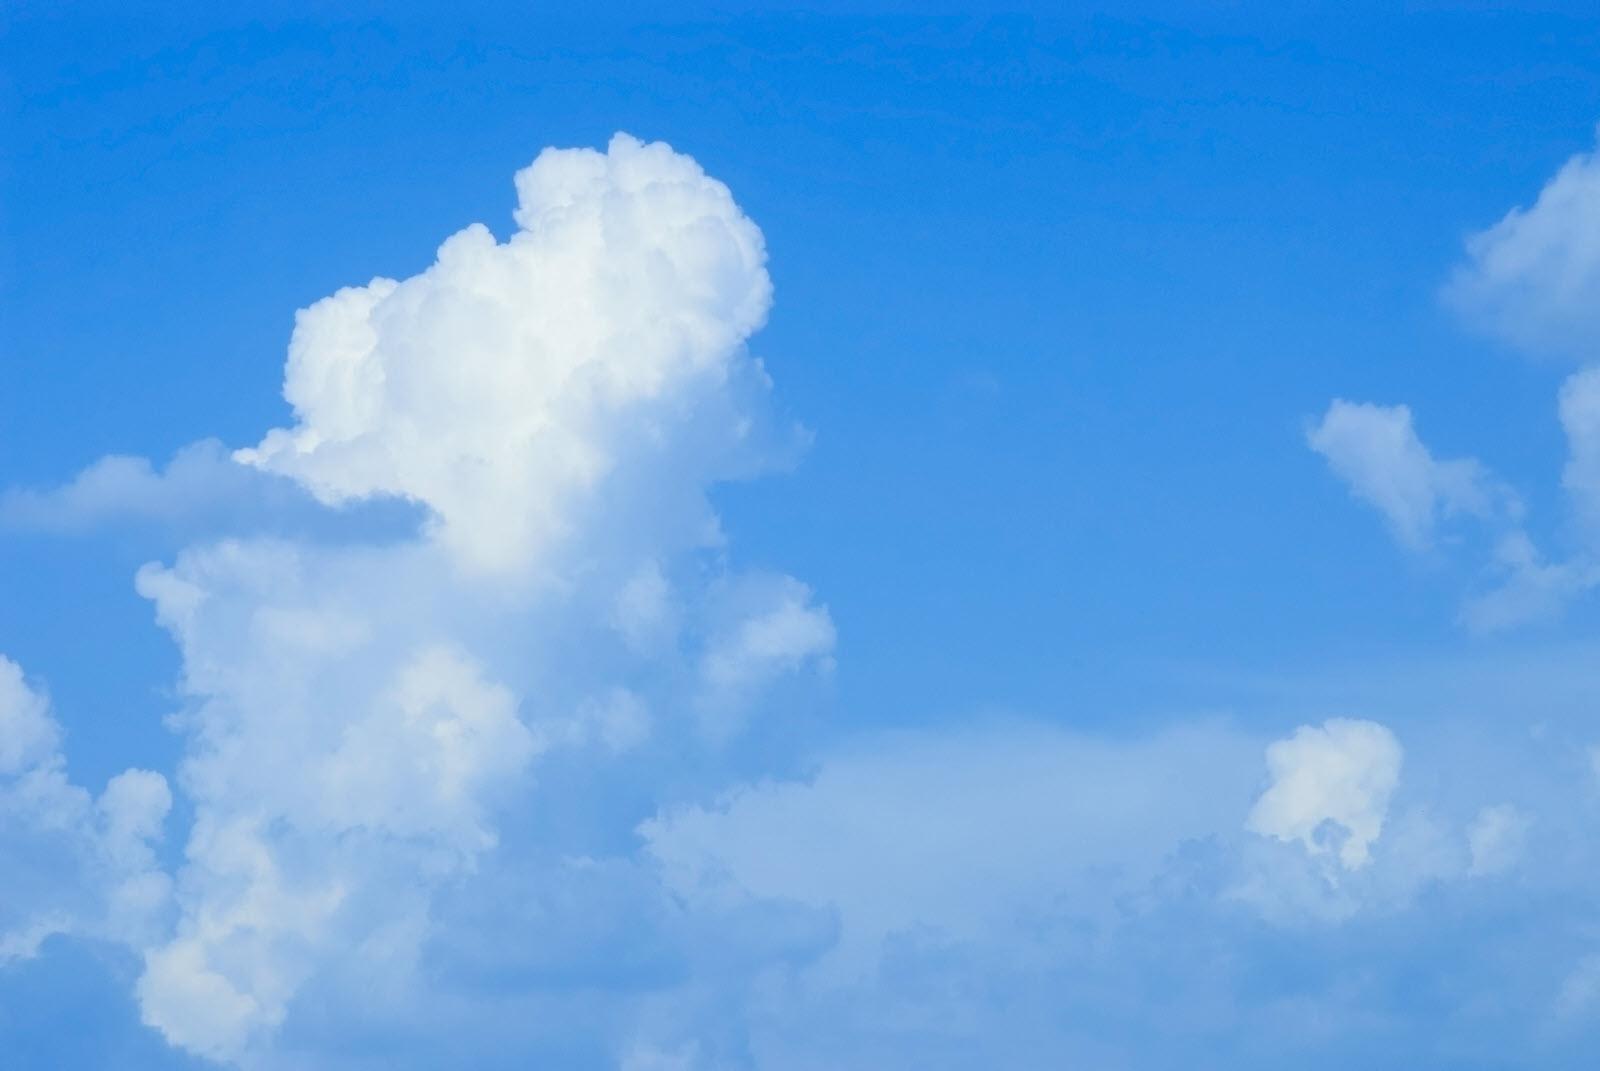 Background mây trắng xanh